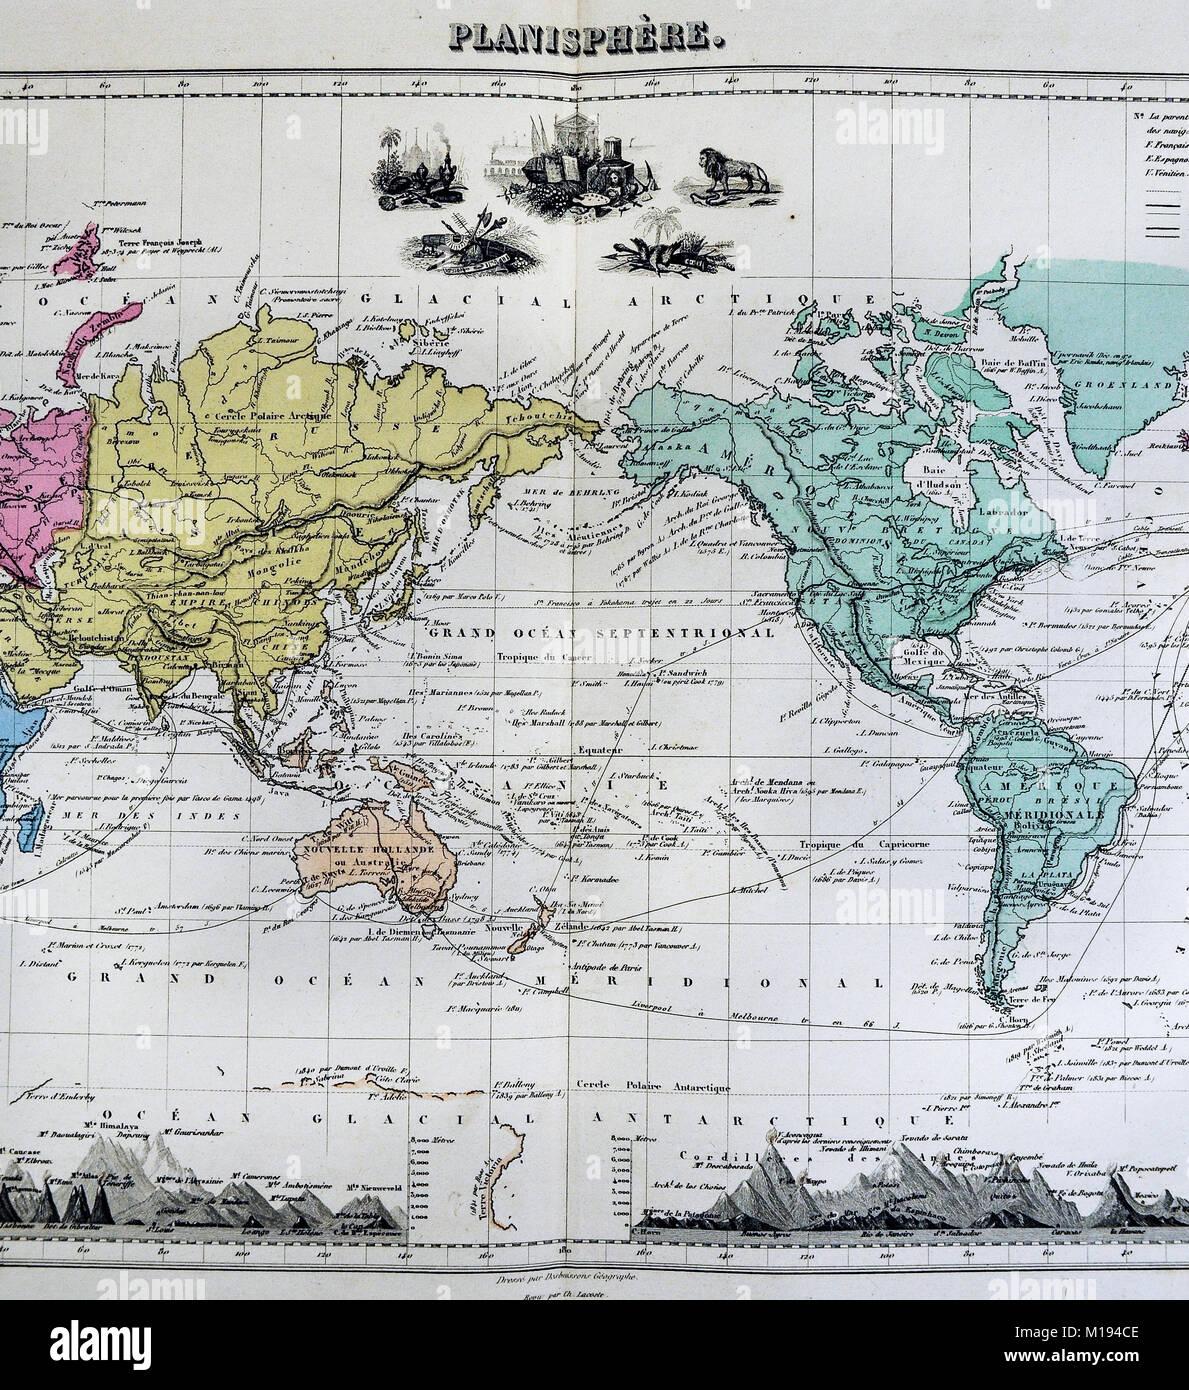 1877 Migeon Map - World Planisphere - Eastern Western - North ...